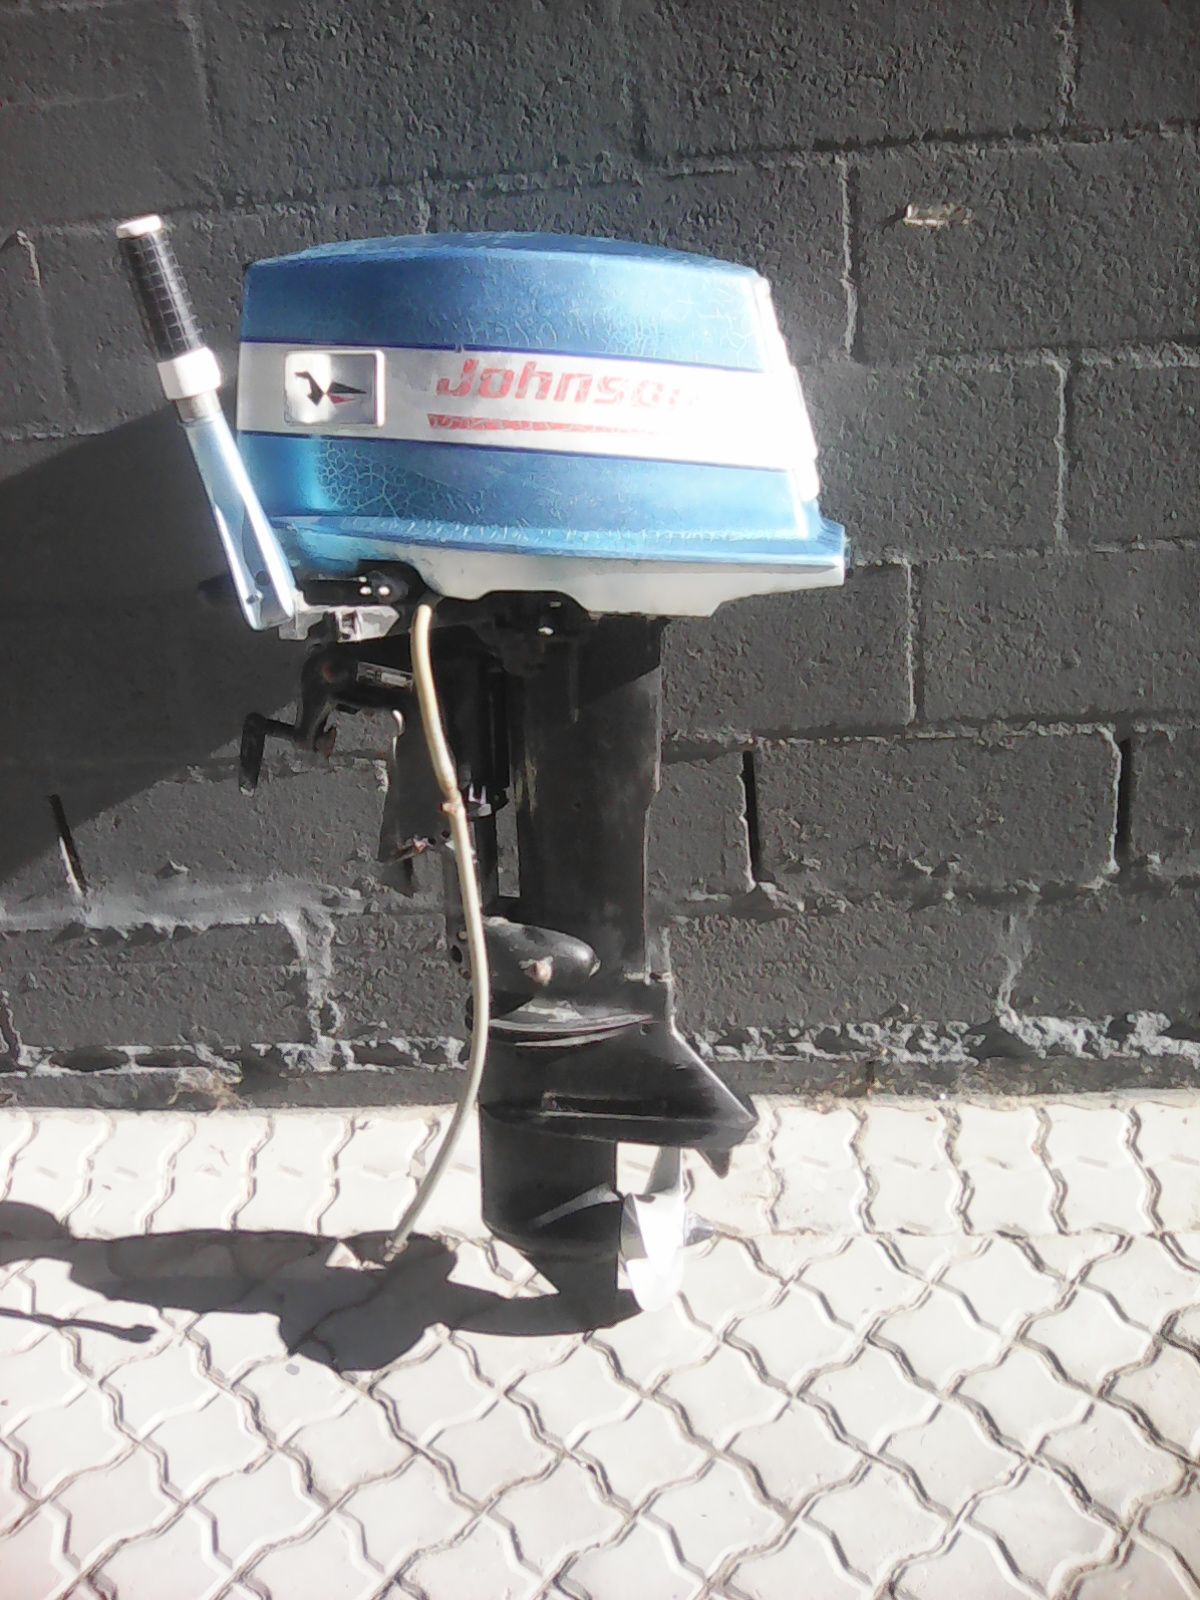 Johnson 20 Hp 2 Stroke Outboard Motor Only